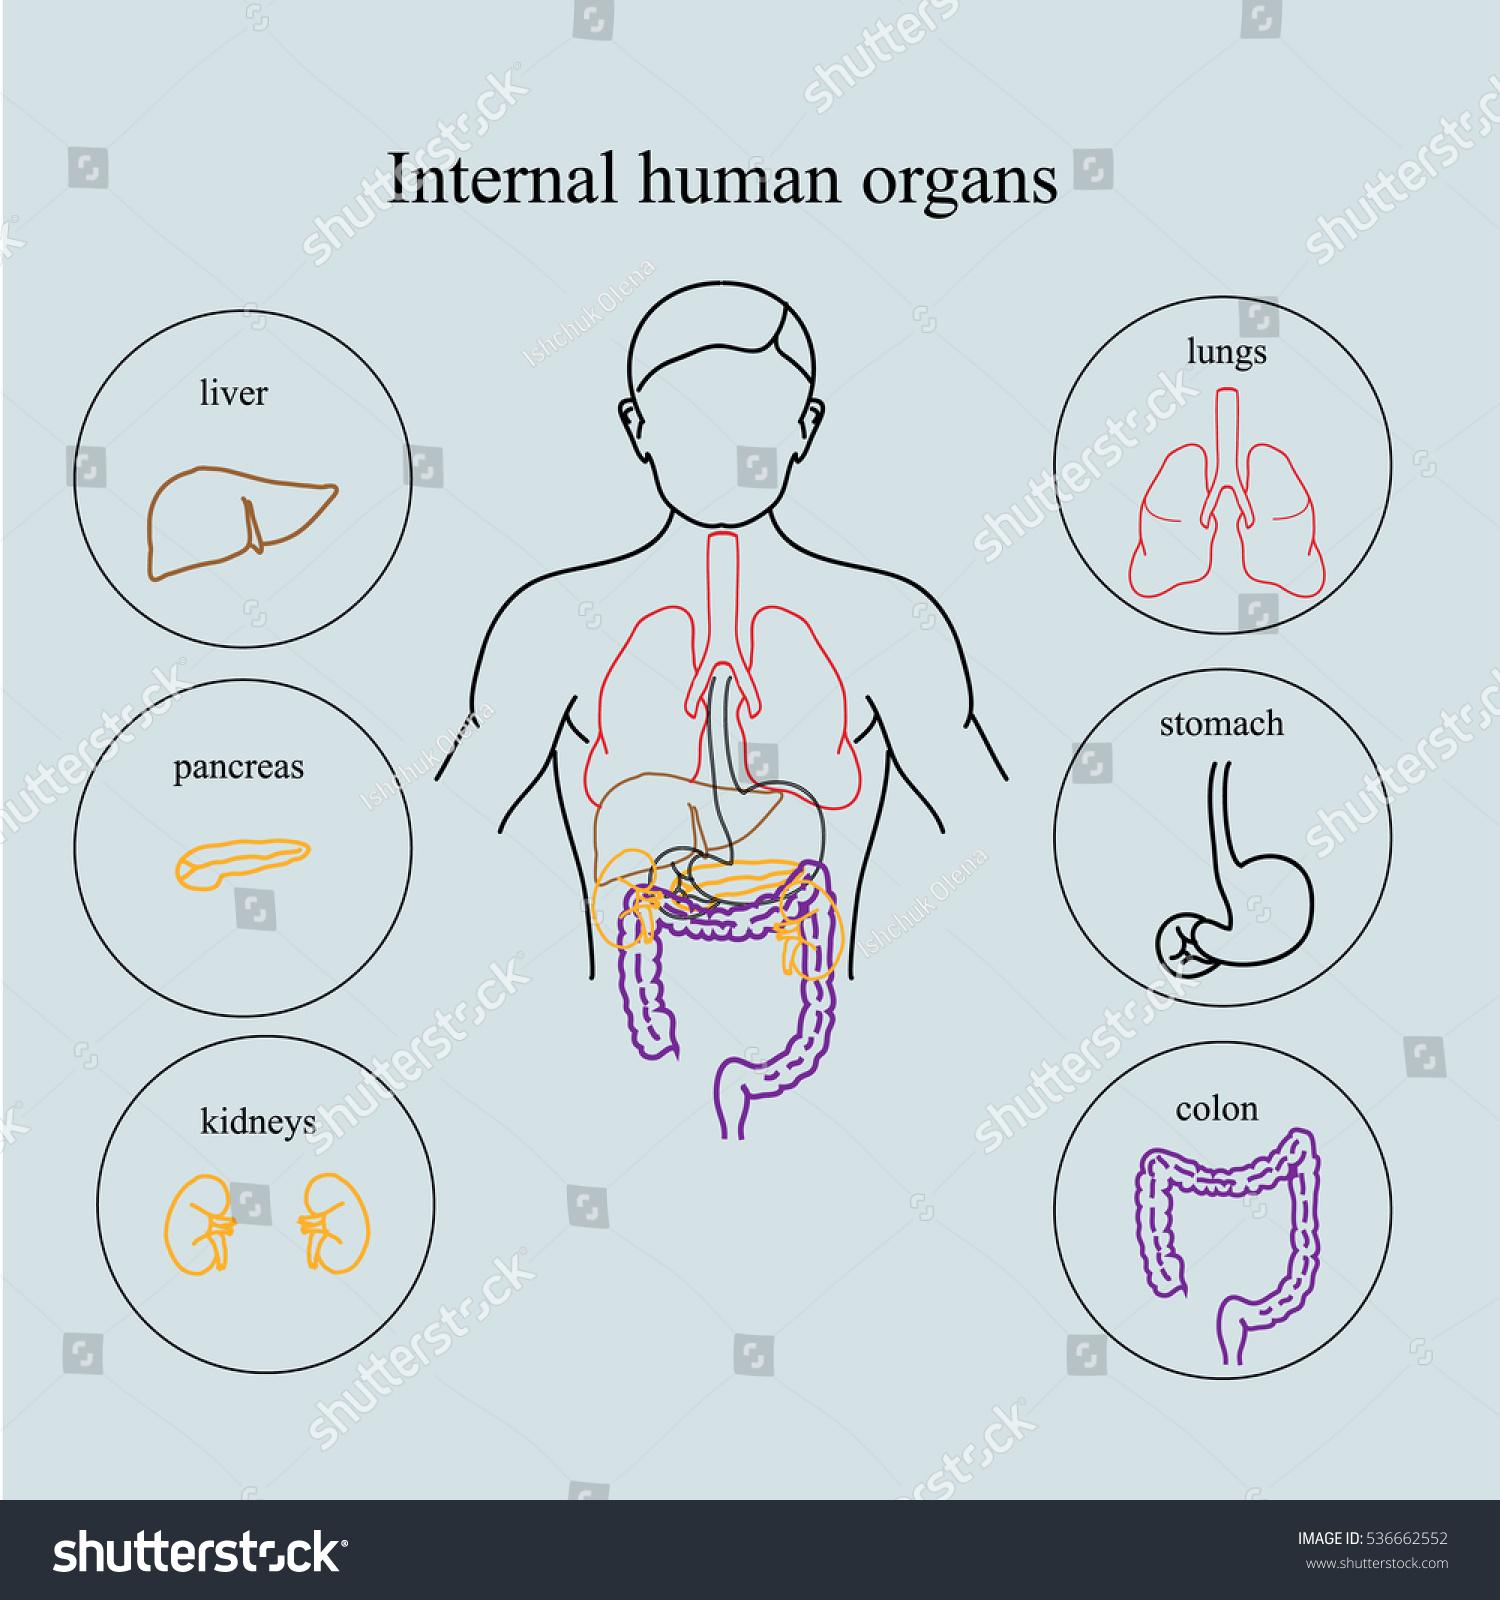 Internal Organs Human Body Anatomy People Stock Illustration ...